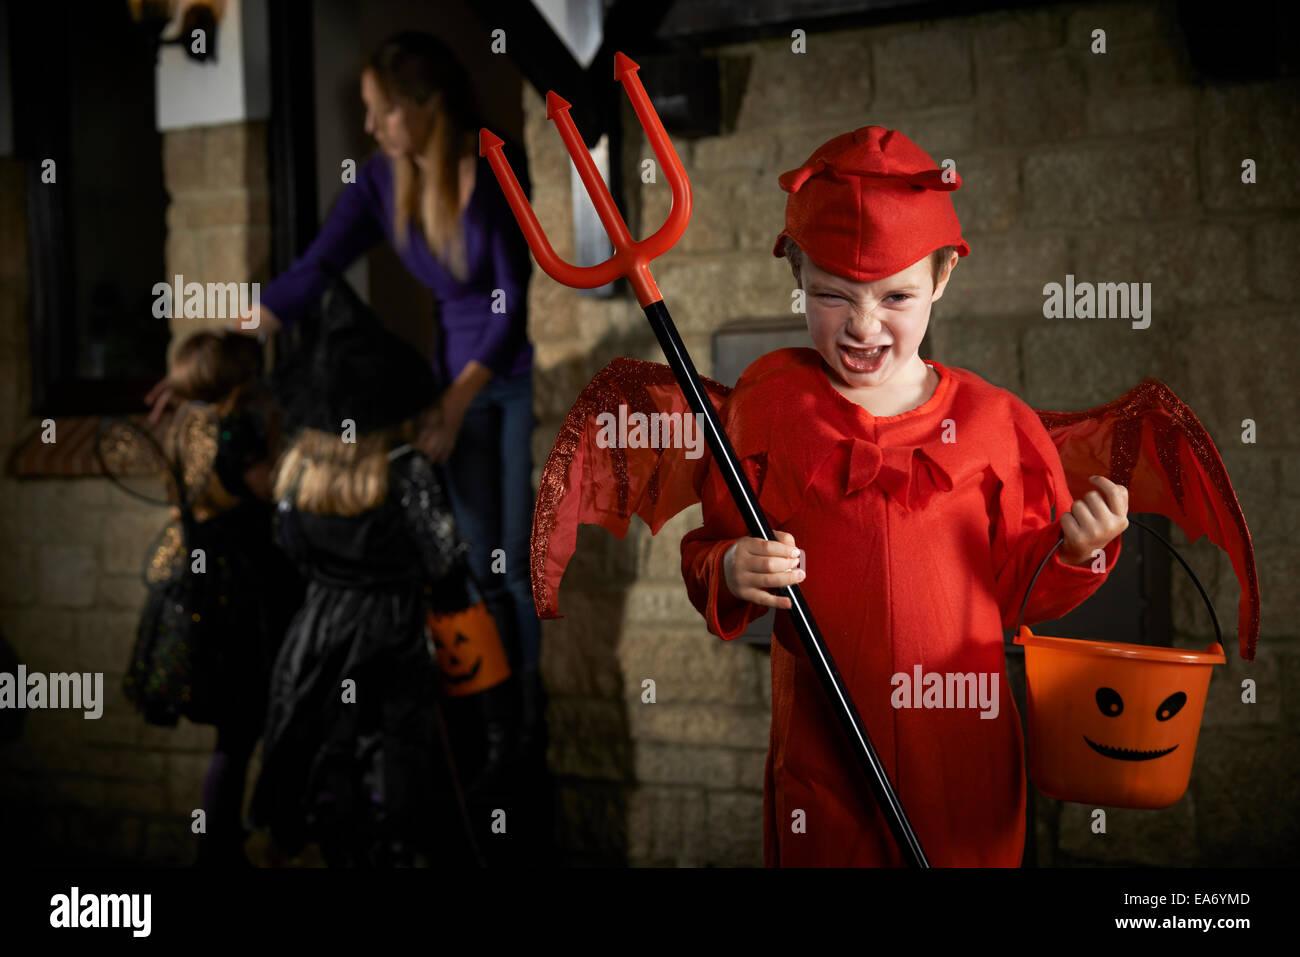 Halloween-Party mit Kinder Süßes oder Saures In Tracht Stockbild